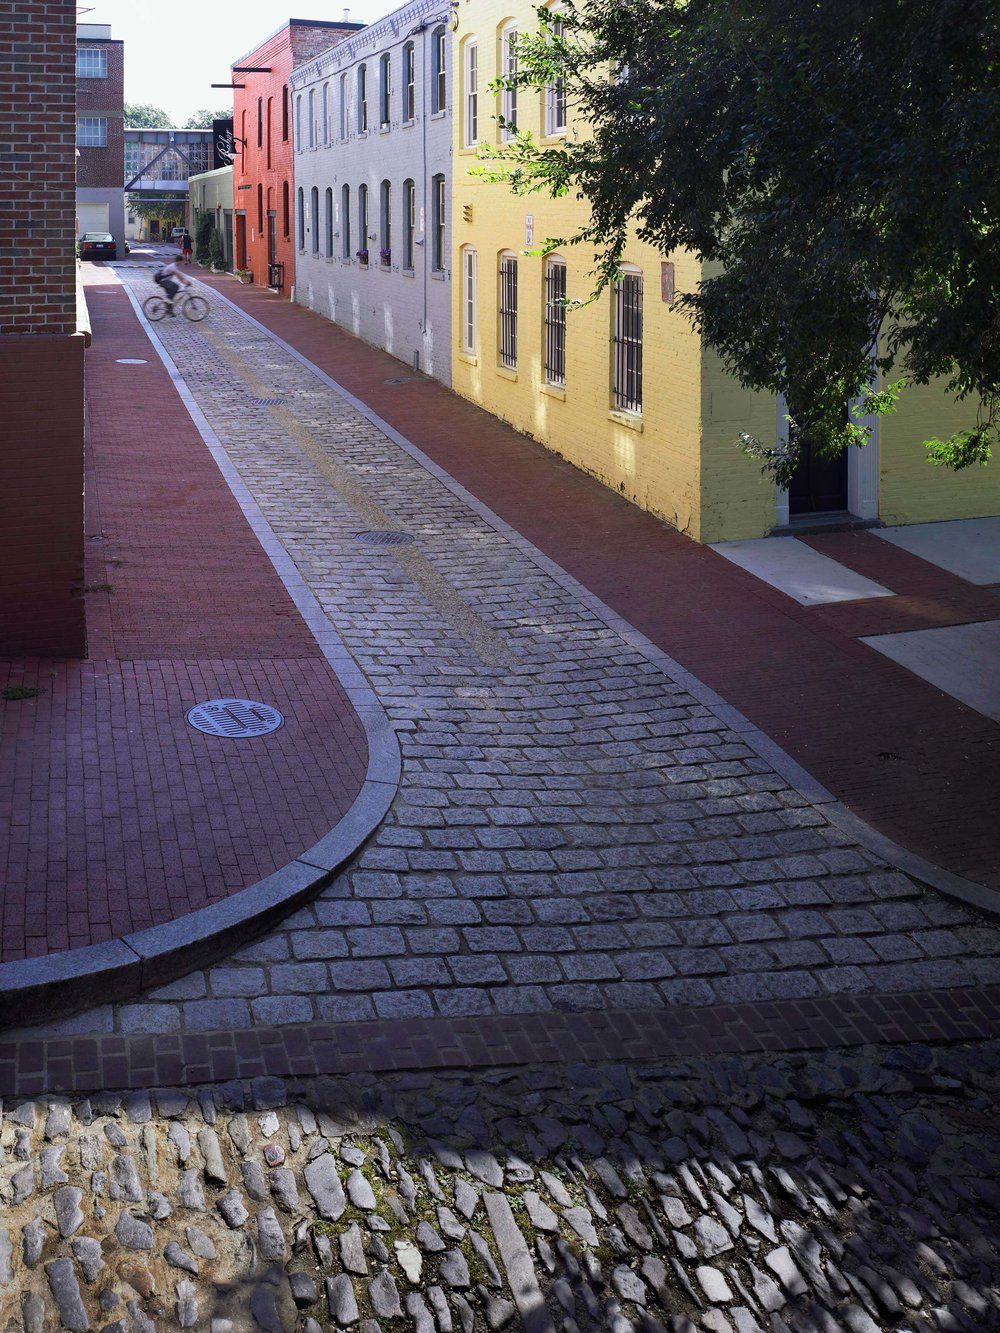 02B - Cady's Alley - Cady's_prakash051002_03.jpg